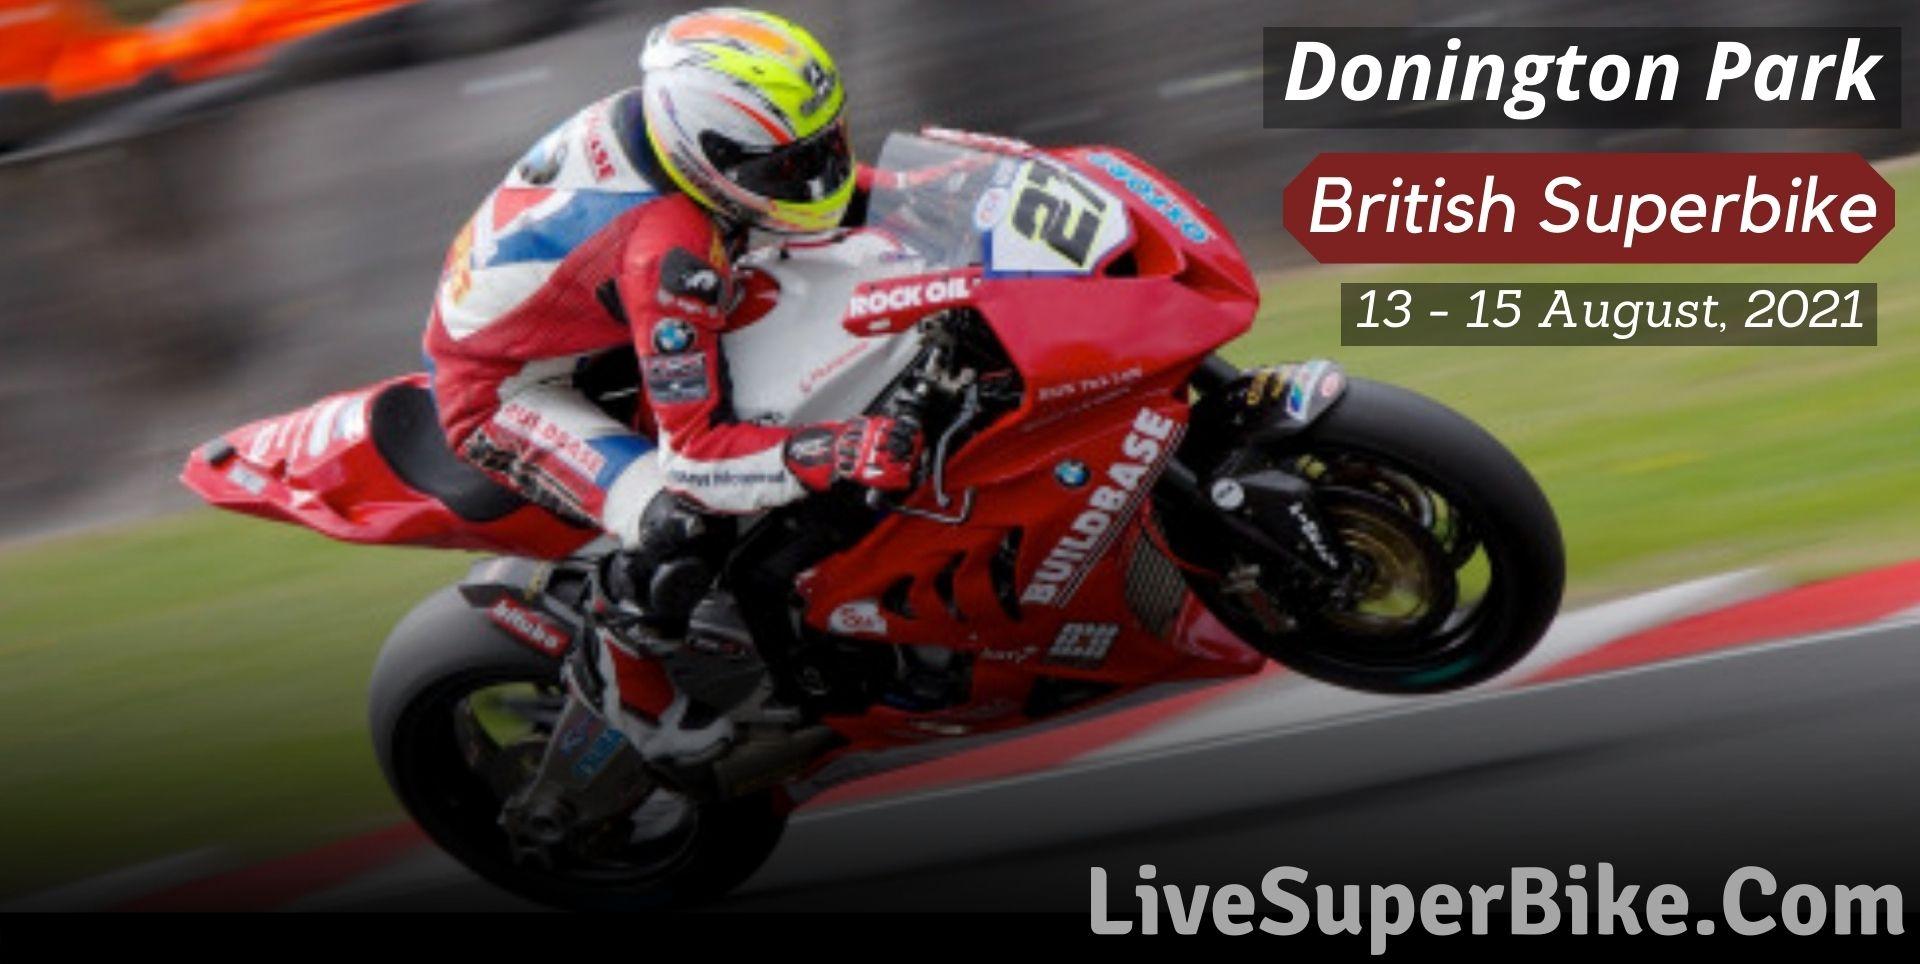 Donington Park British Superbike Live Stream 2021